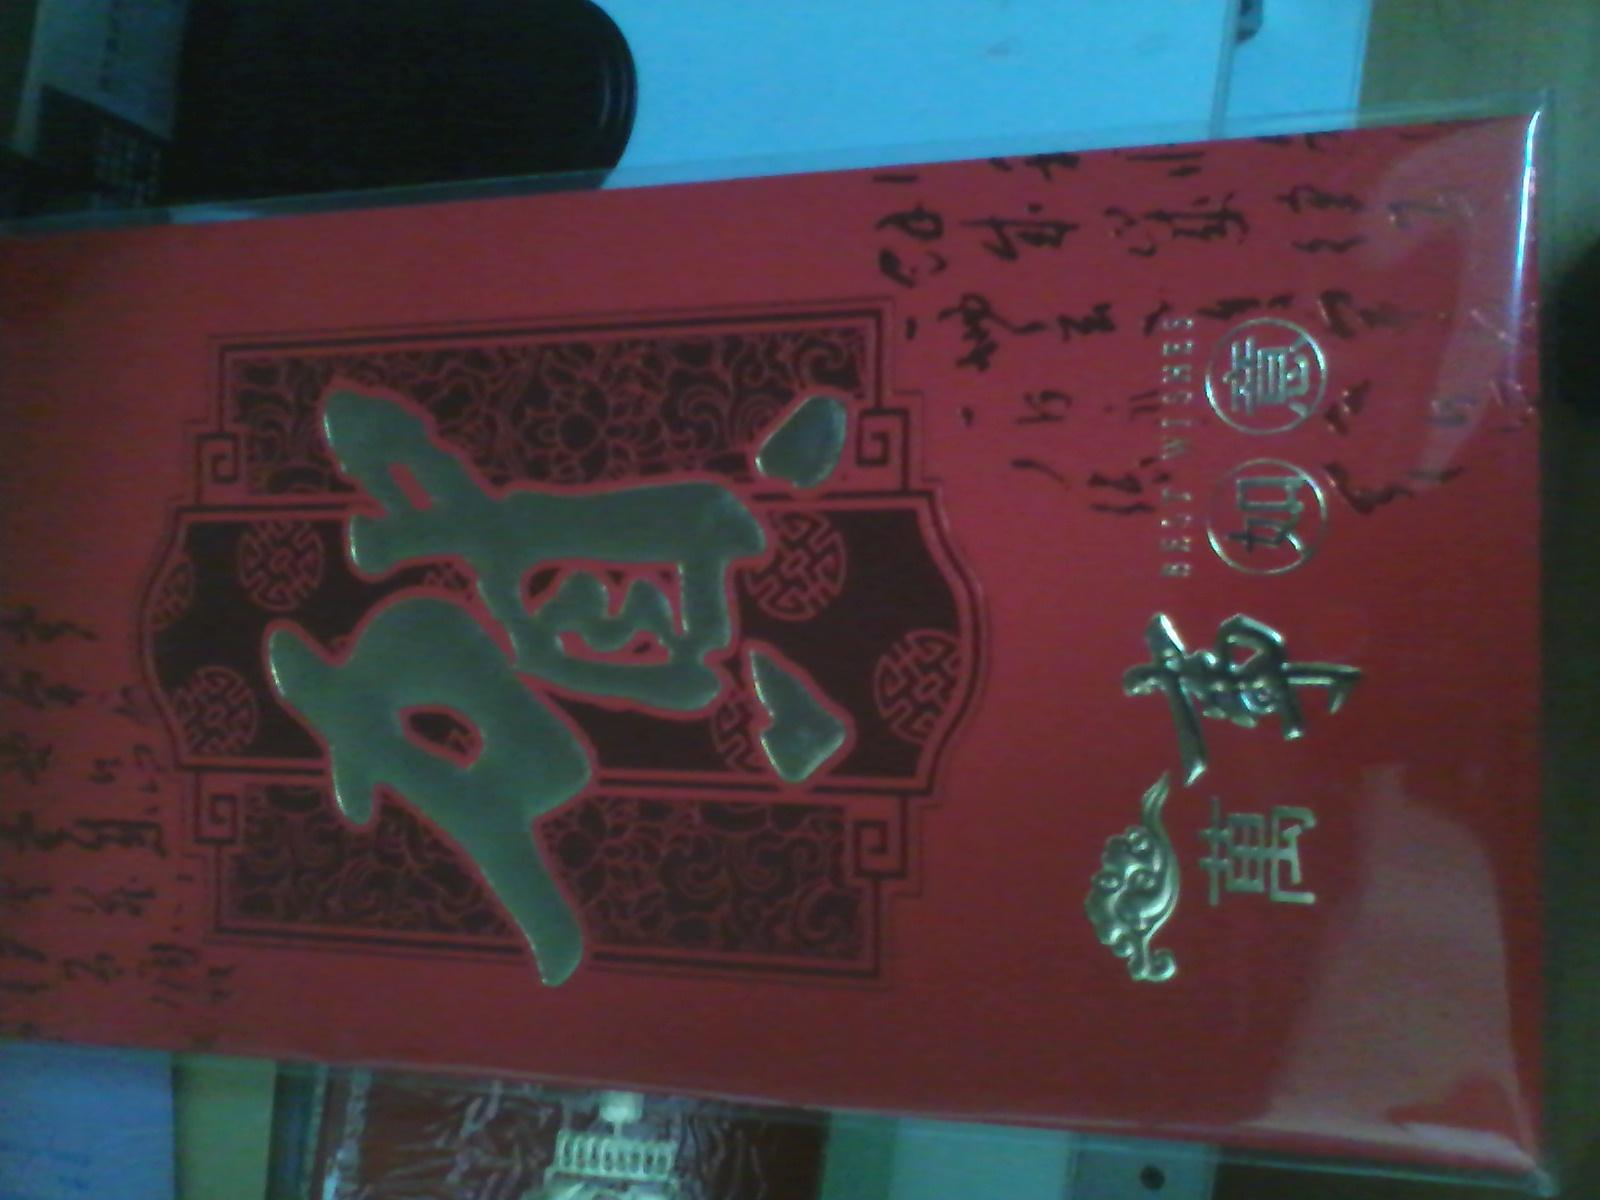 jordans infrared red 00973750 store